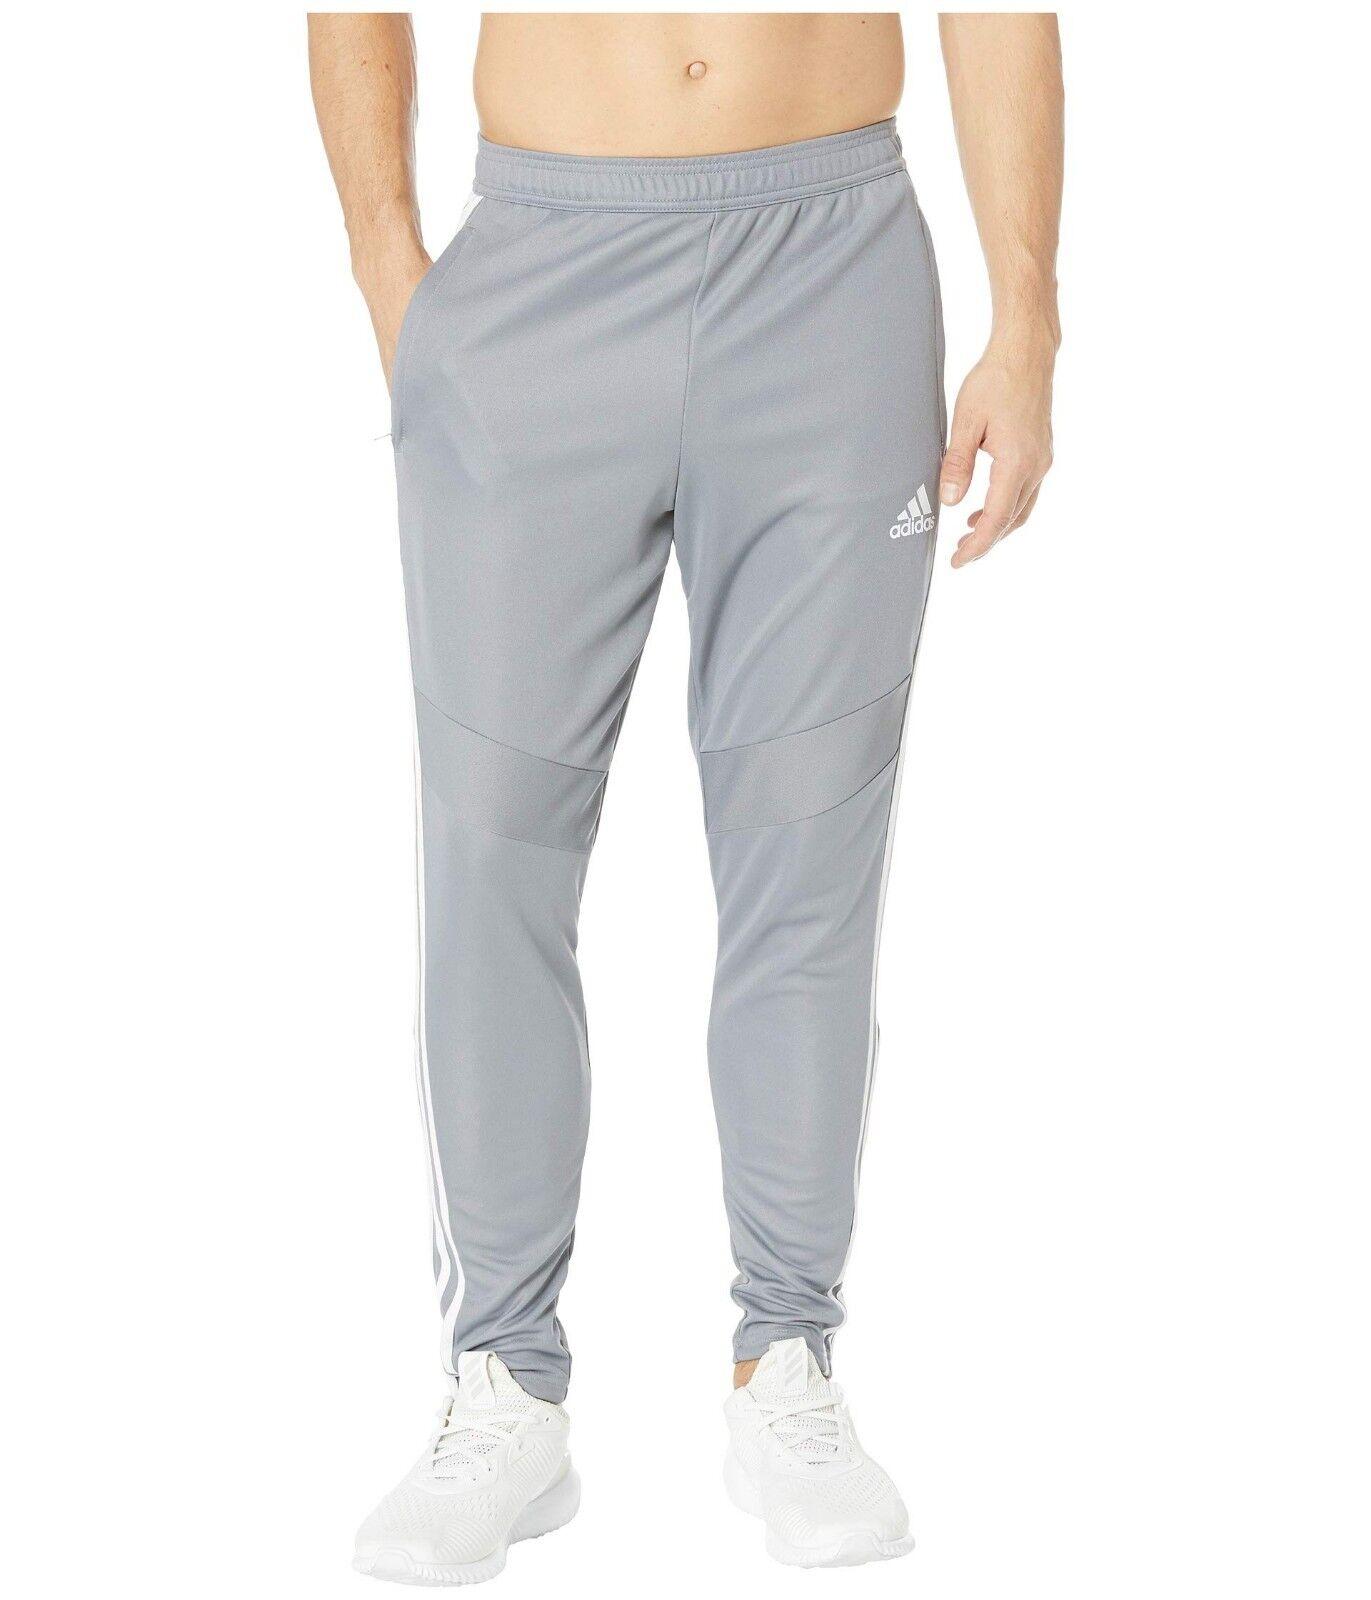 Adidas Grey White Tiro 19 Training Pants